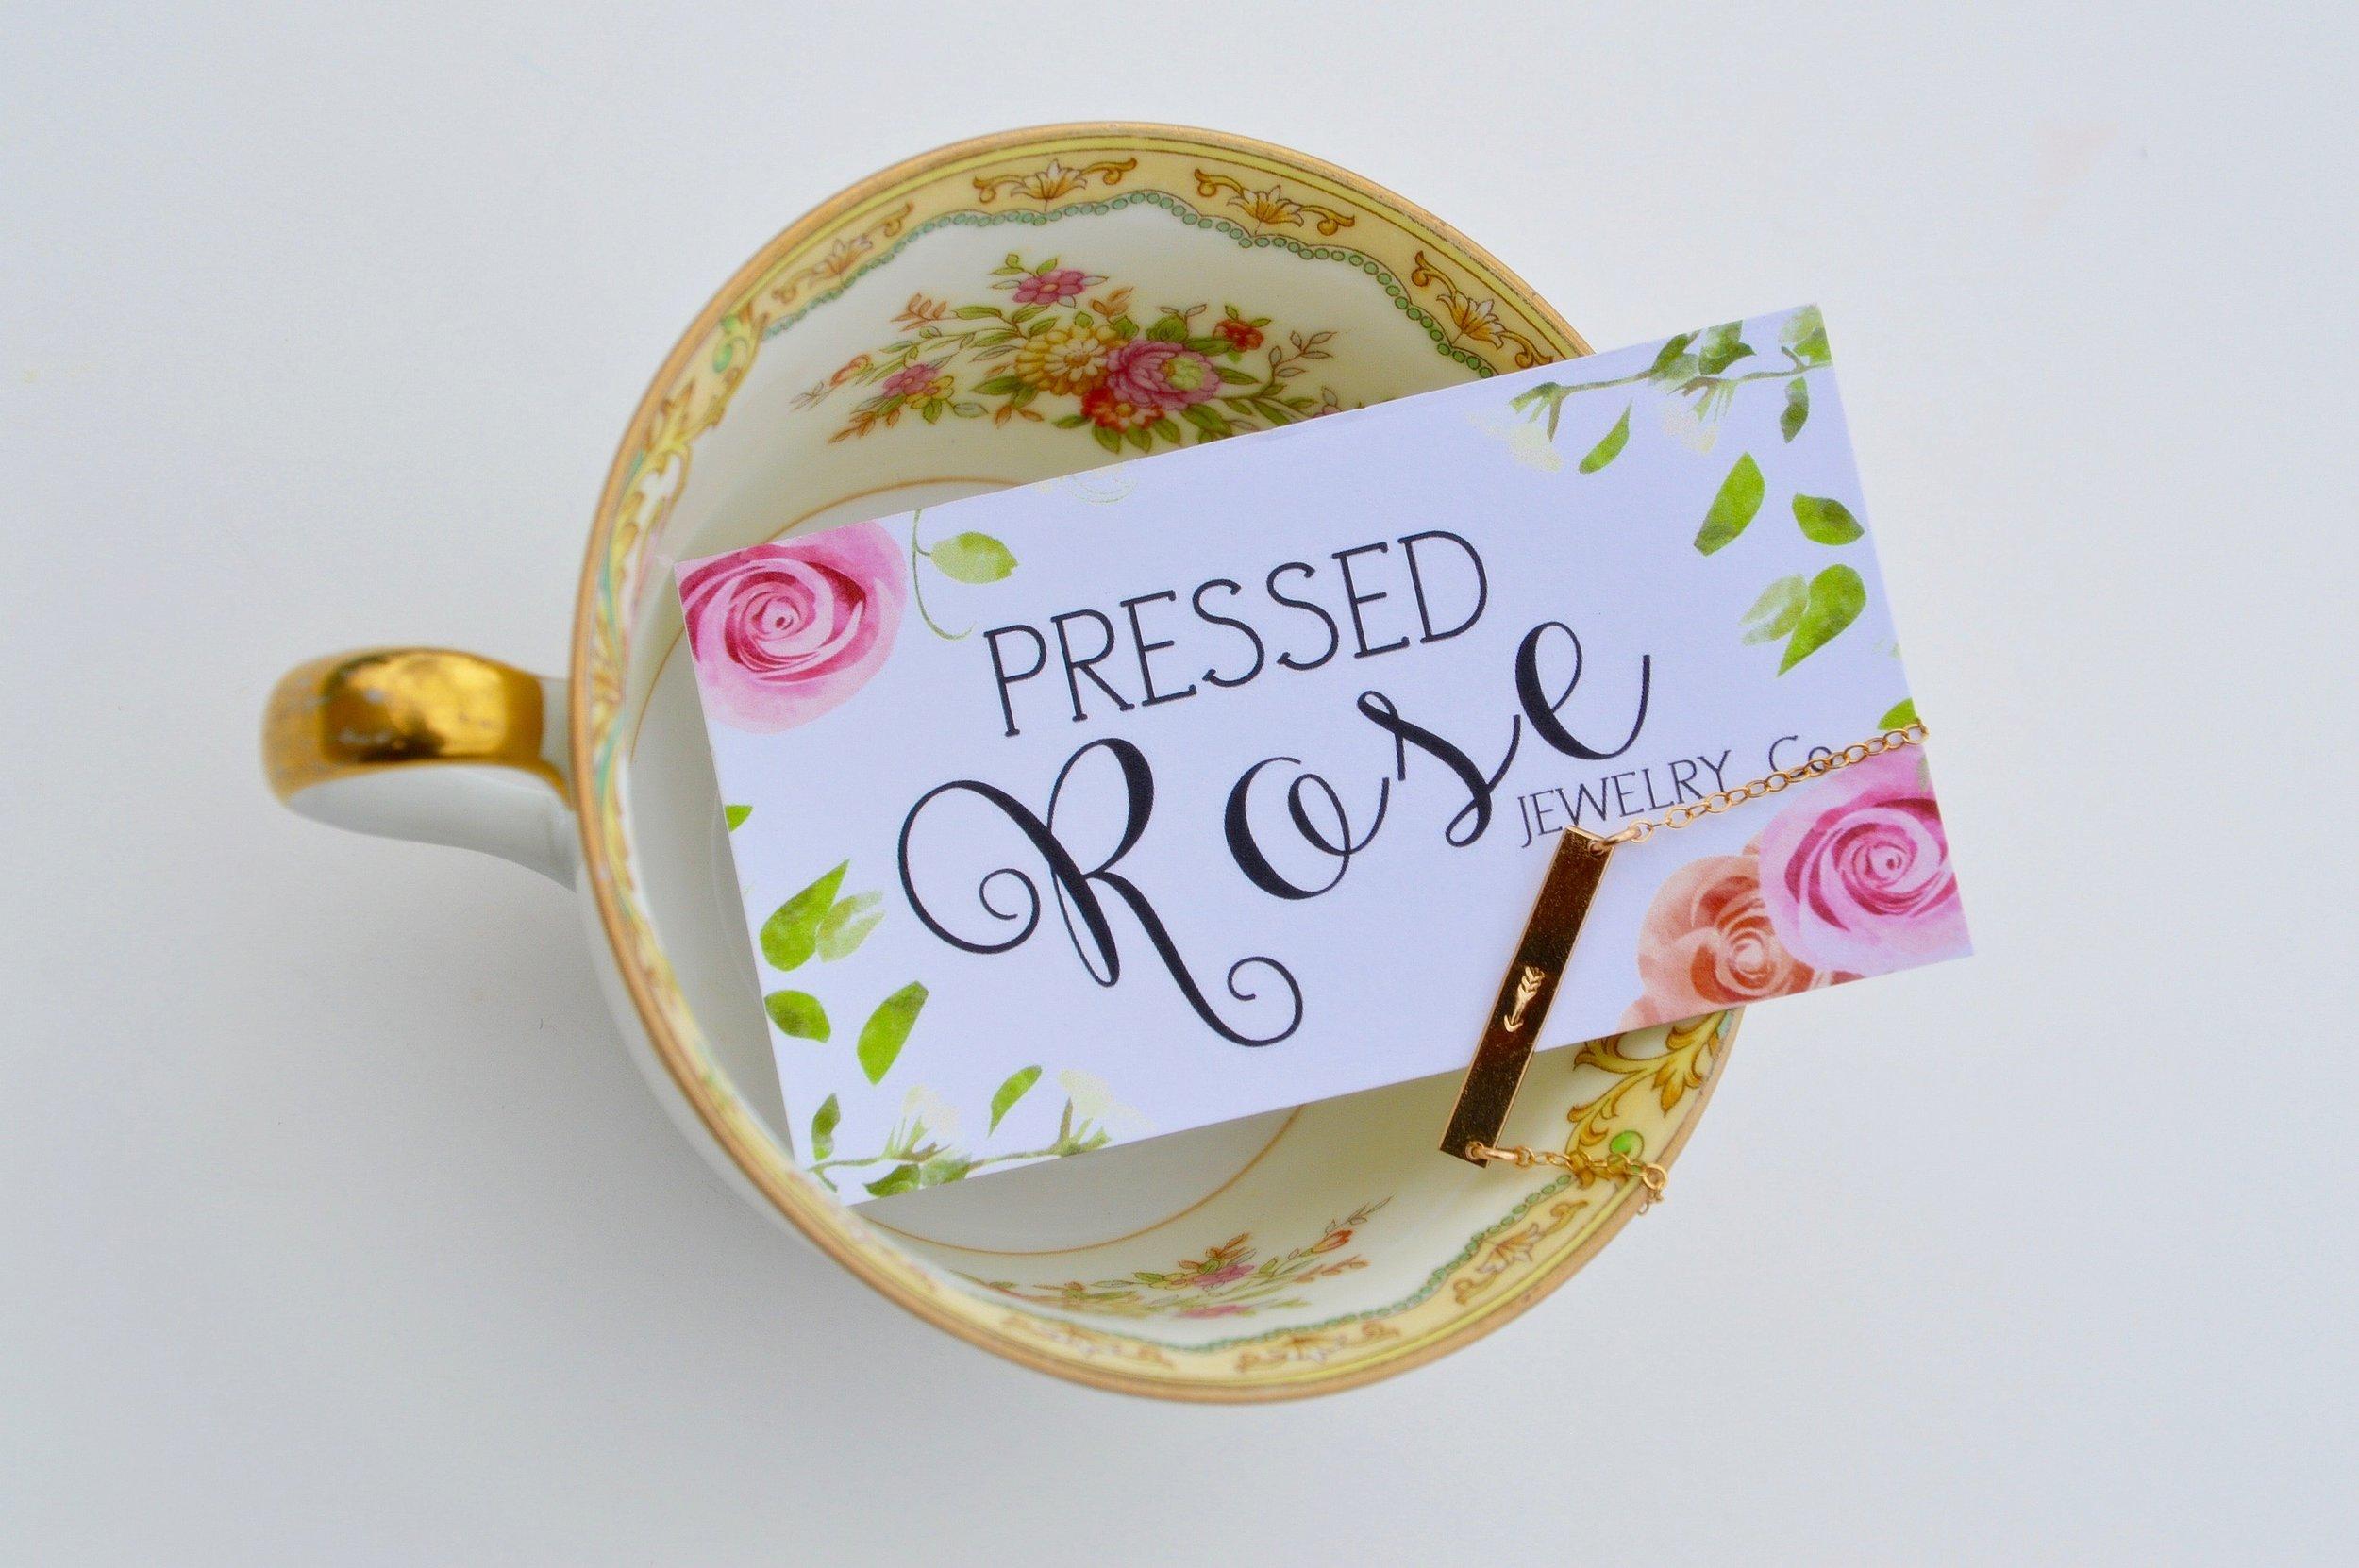 Pressed Rose Jewelry Co.